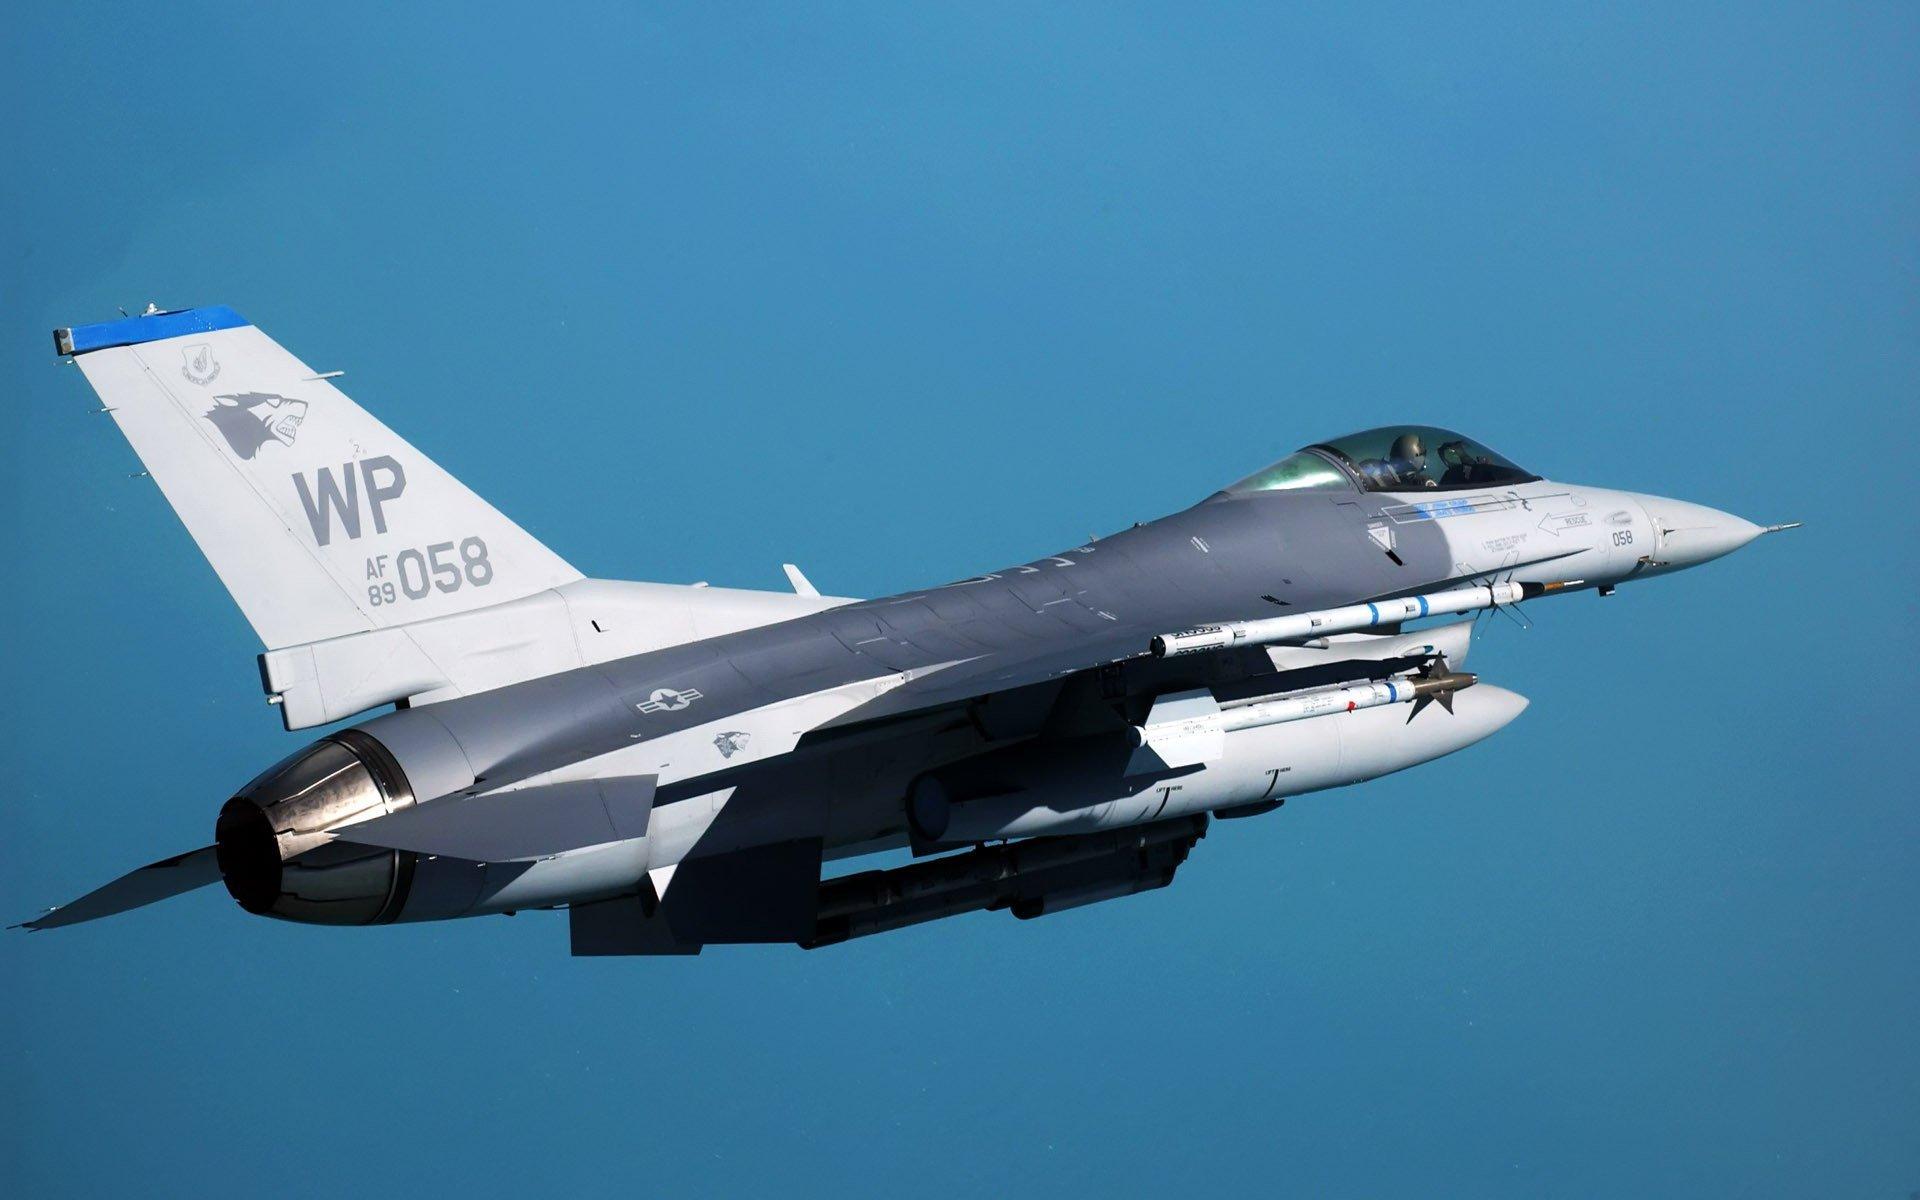 General Dynamics F 16 Fighting Falcon Hd Wallpaper: General Dynamics F-16 Fighting Falcon Full HD Wallpaper